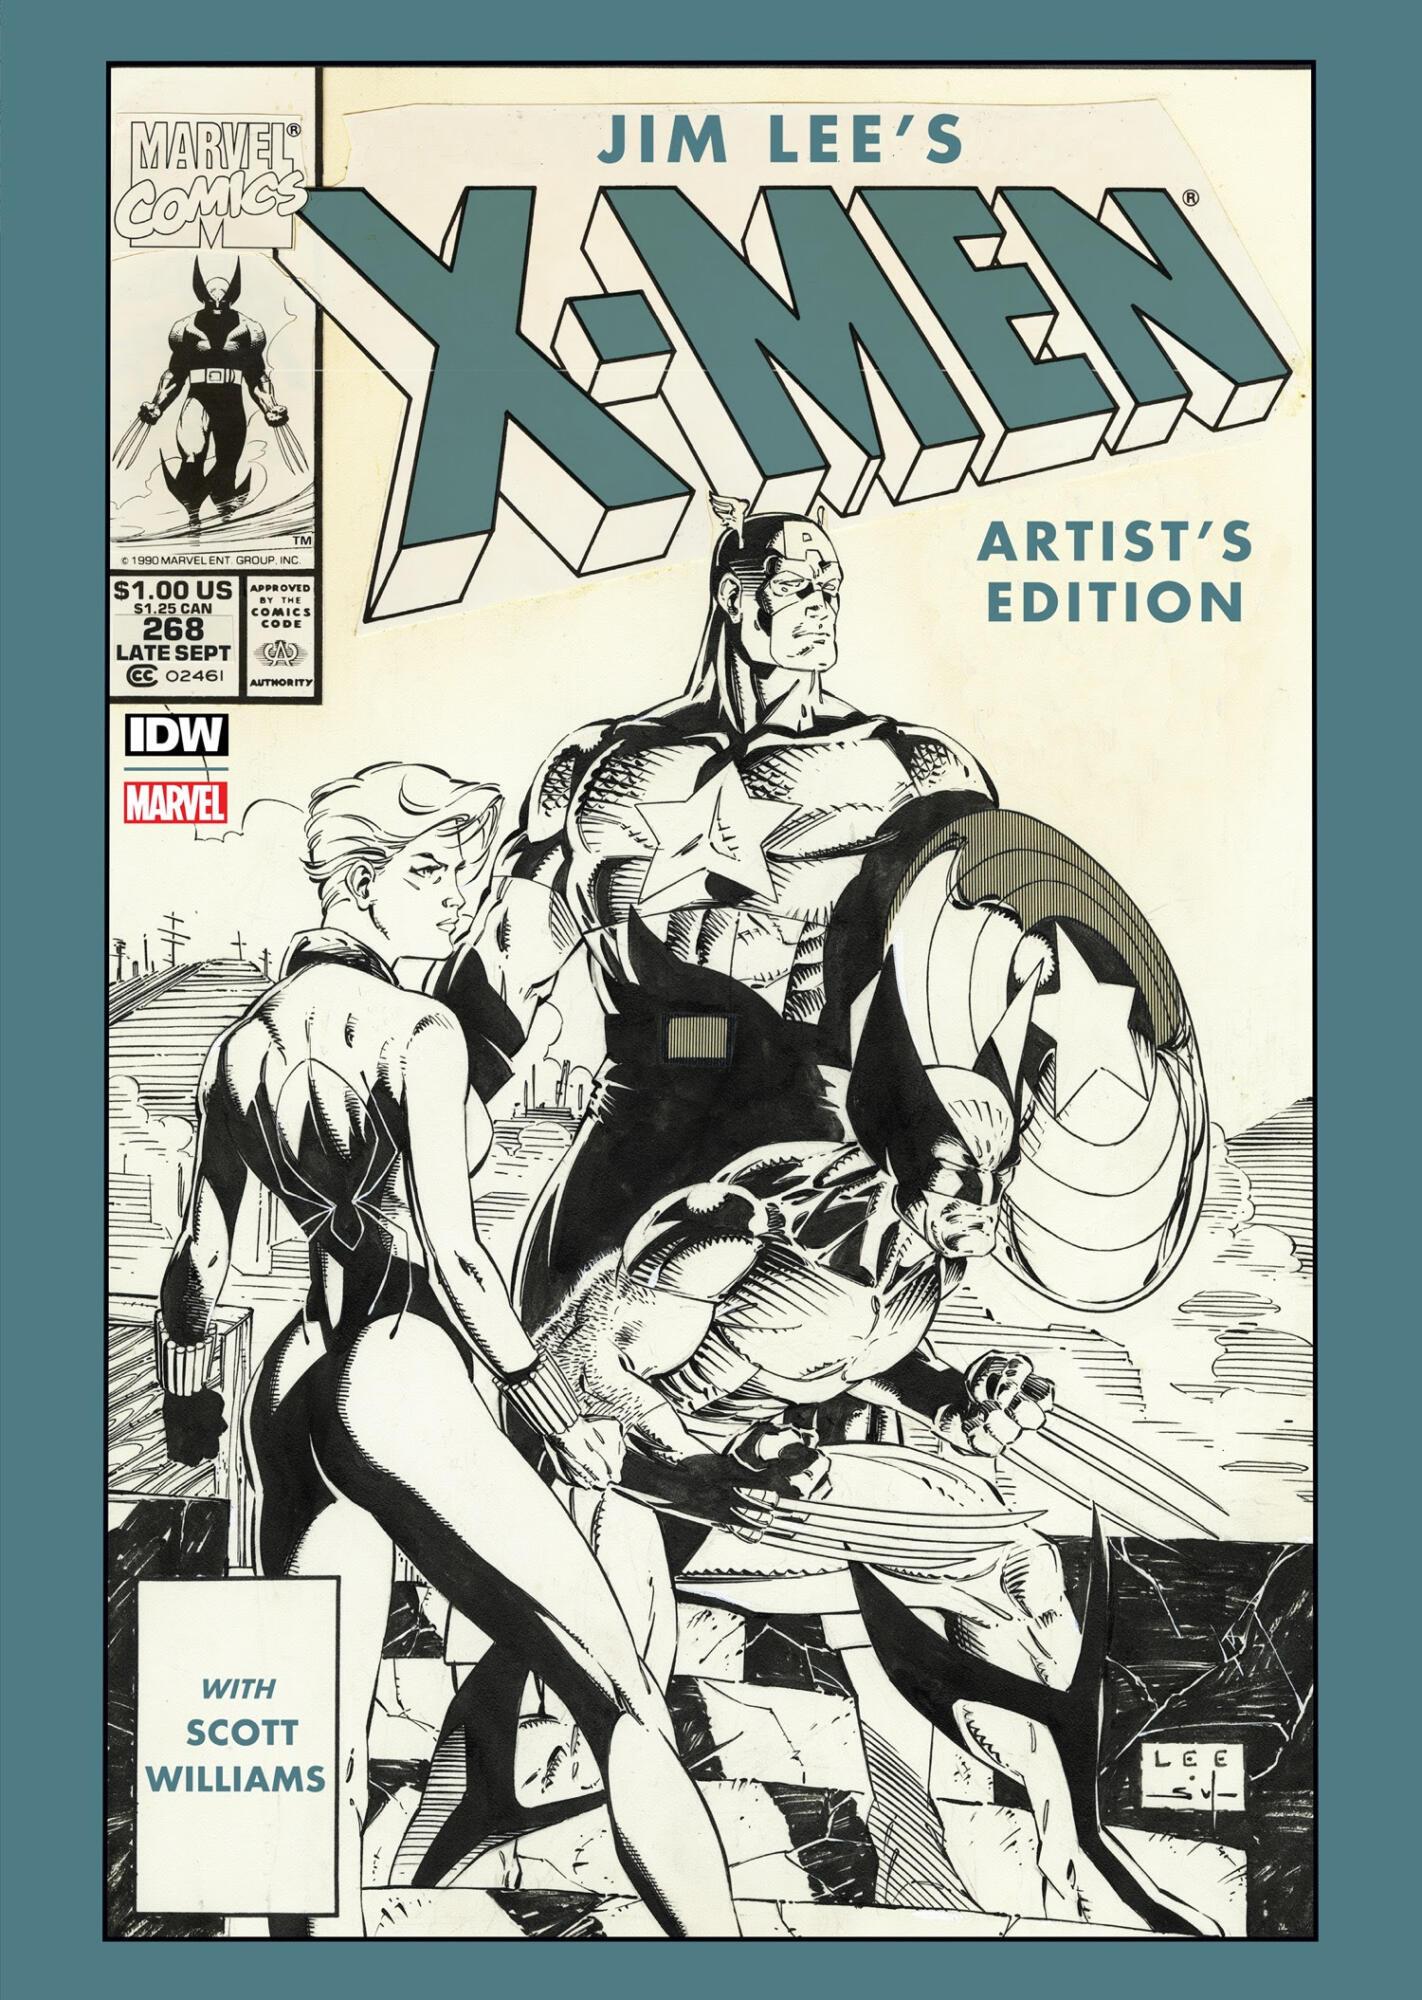 IDW Presents Jim Lee's X-Men Artist's Edition